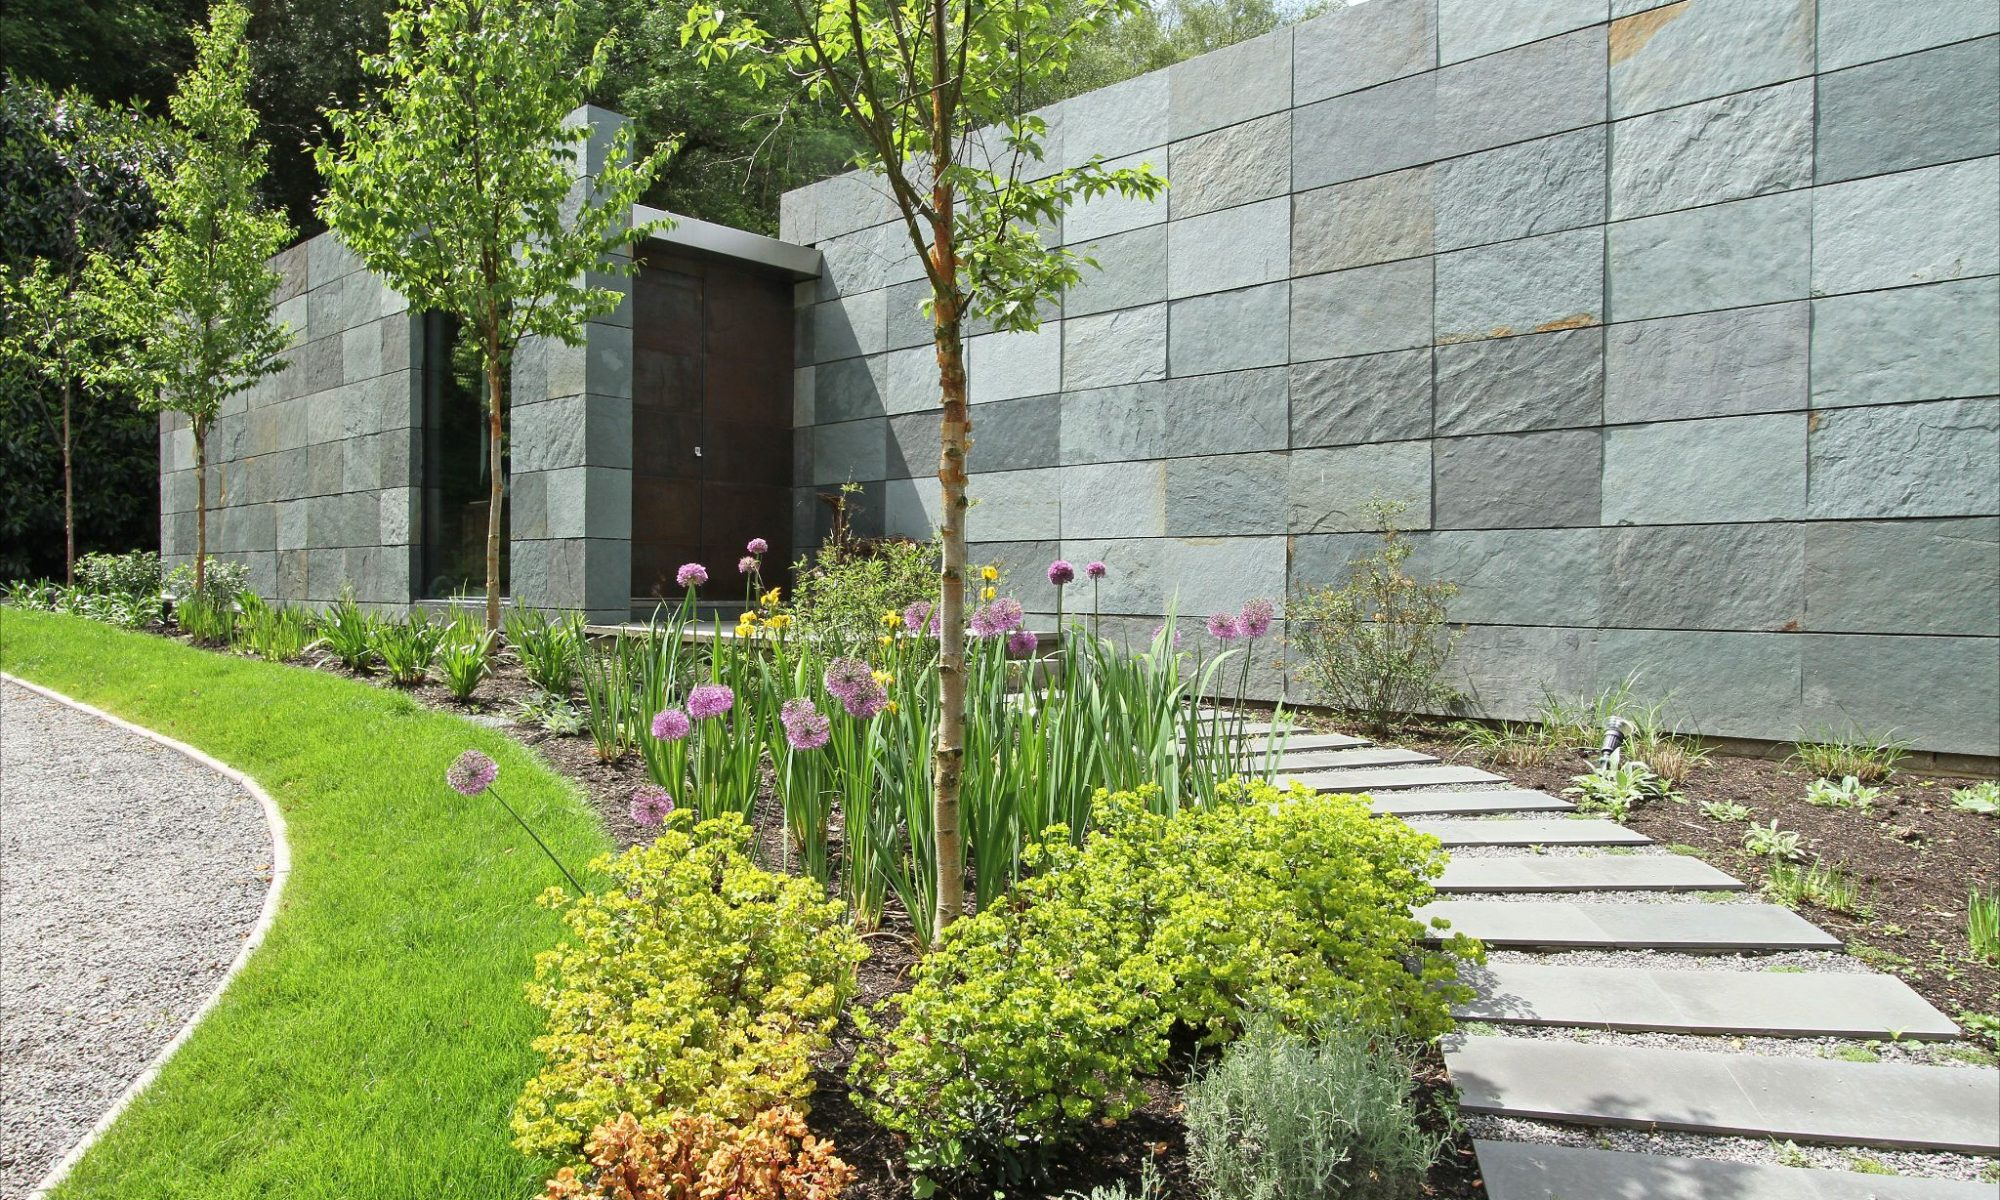 Garden Landscaping - Border Planting